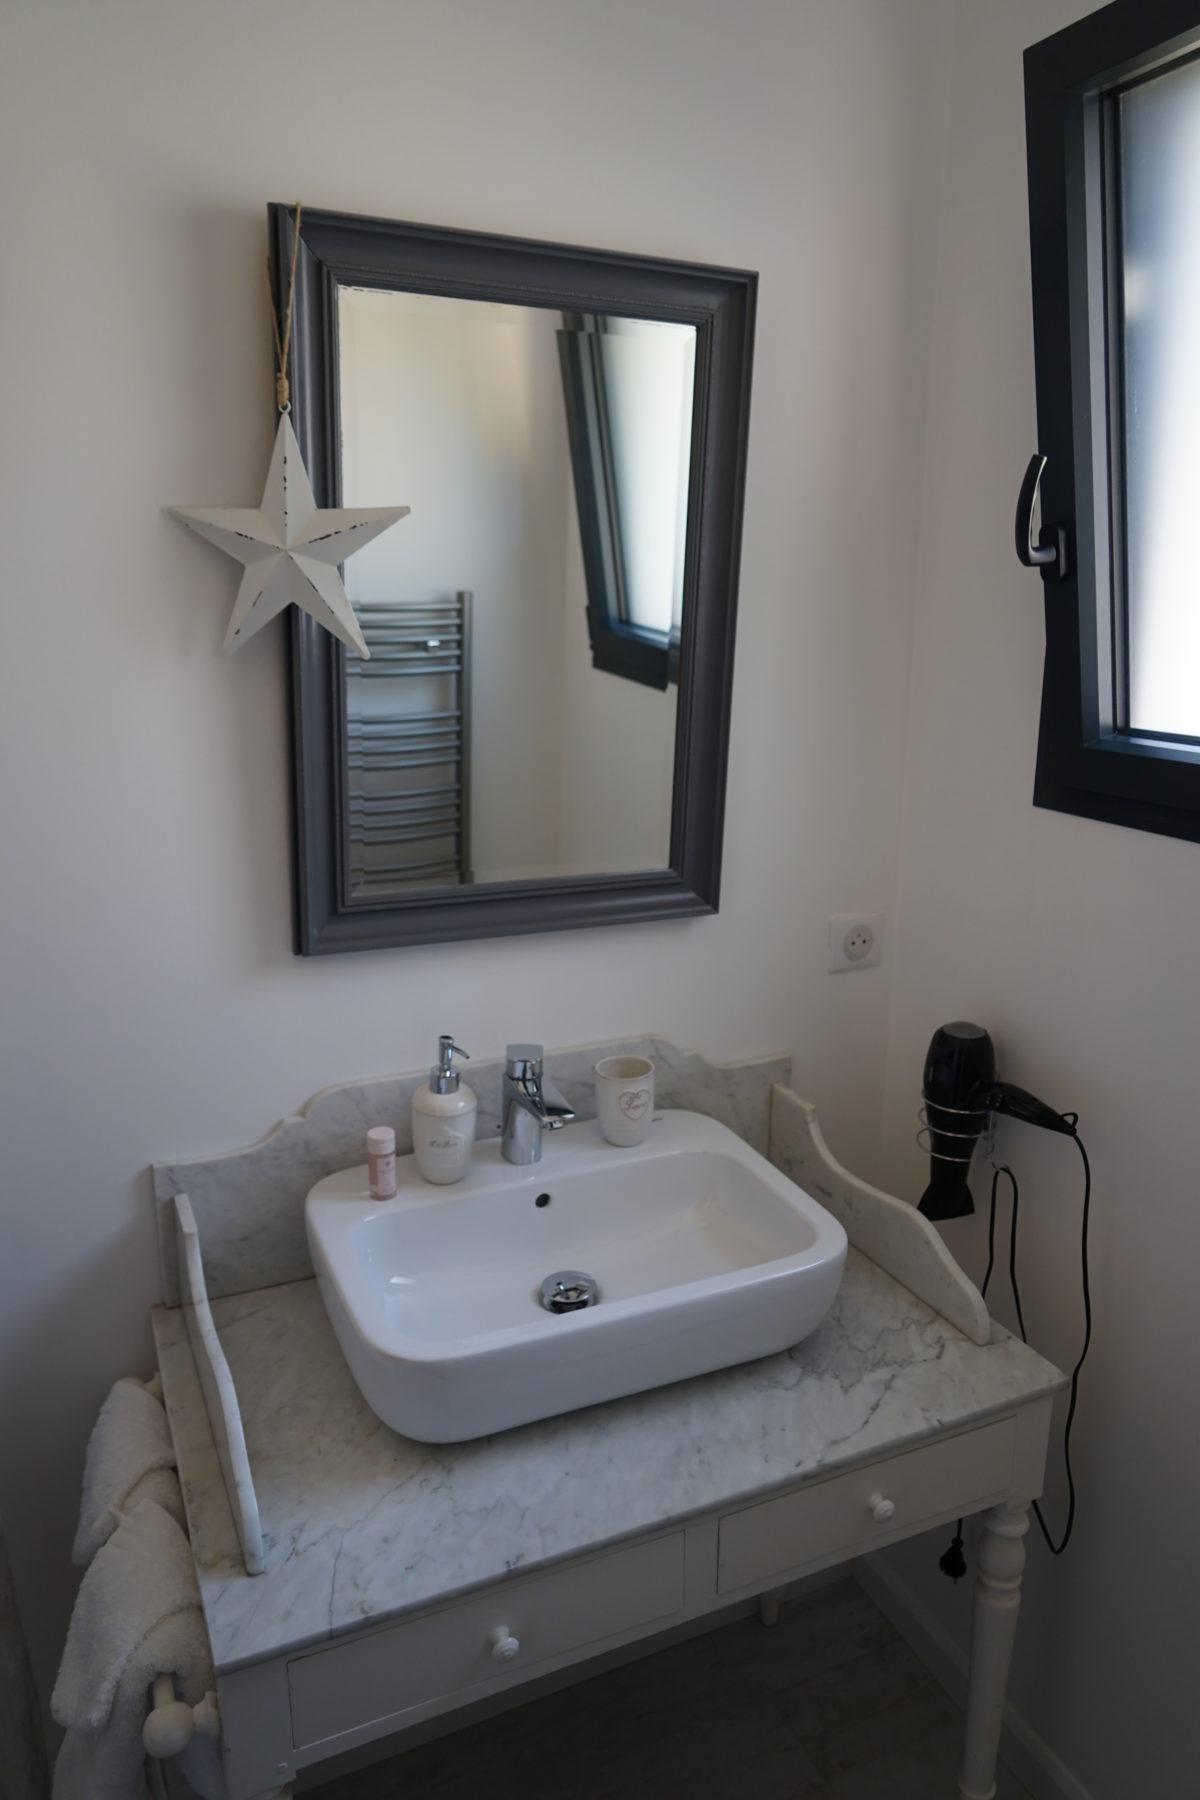 chambre d'hôtes-Flayosc-la Villa aux oliviers-monsieurmada.me